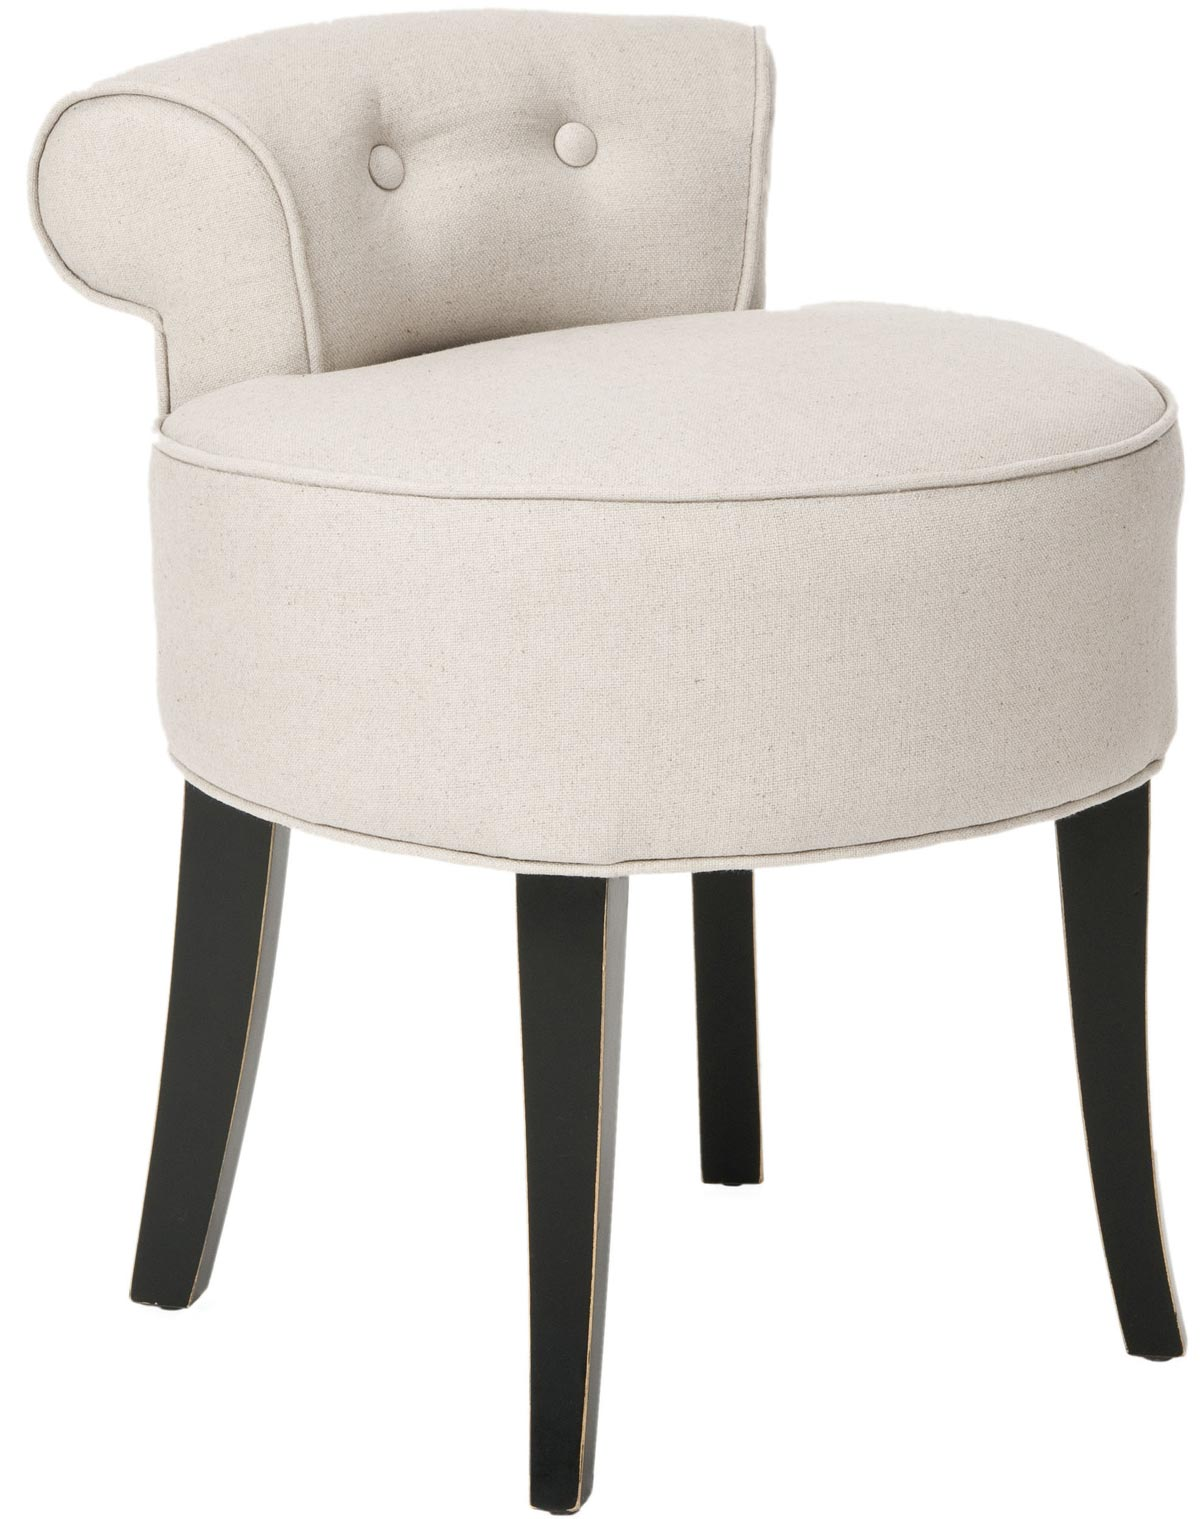 Magnificent Safavieh Mcr4546A Georgia Vanity Chair Ivory 441 00 Ibusinesslaw Wood Chair Design Ideas Ibusinesslaworg